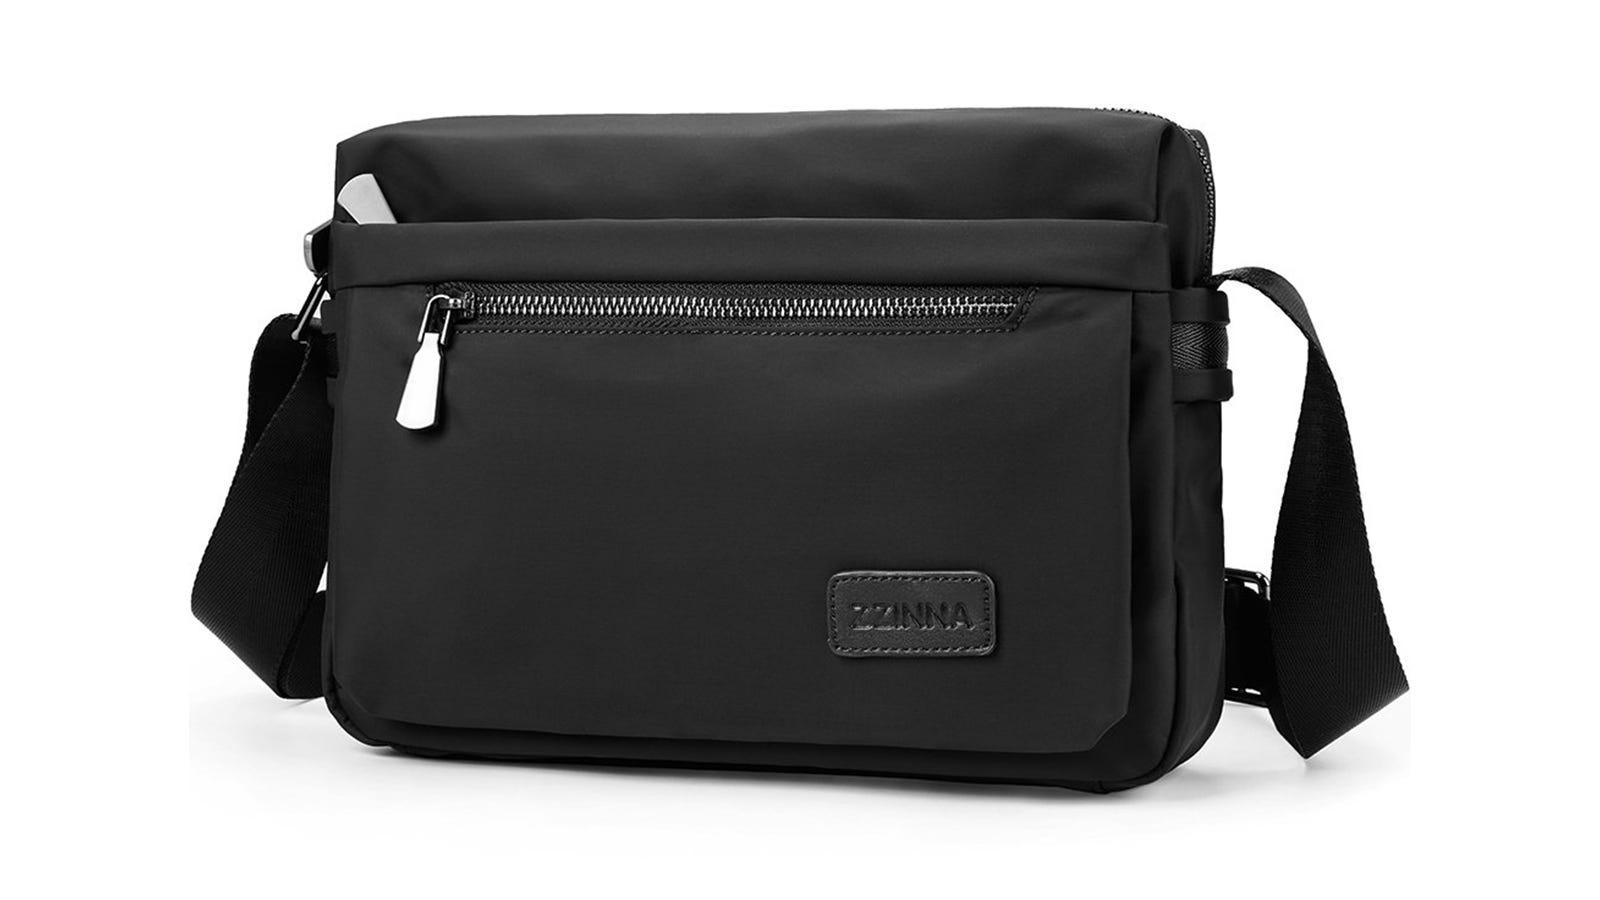 The ZZINNA Man Bag Messenger Bag.